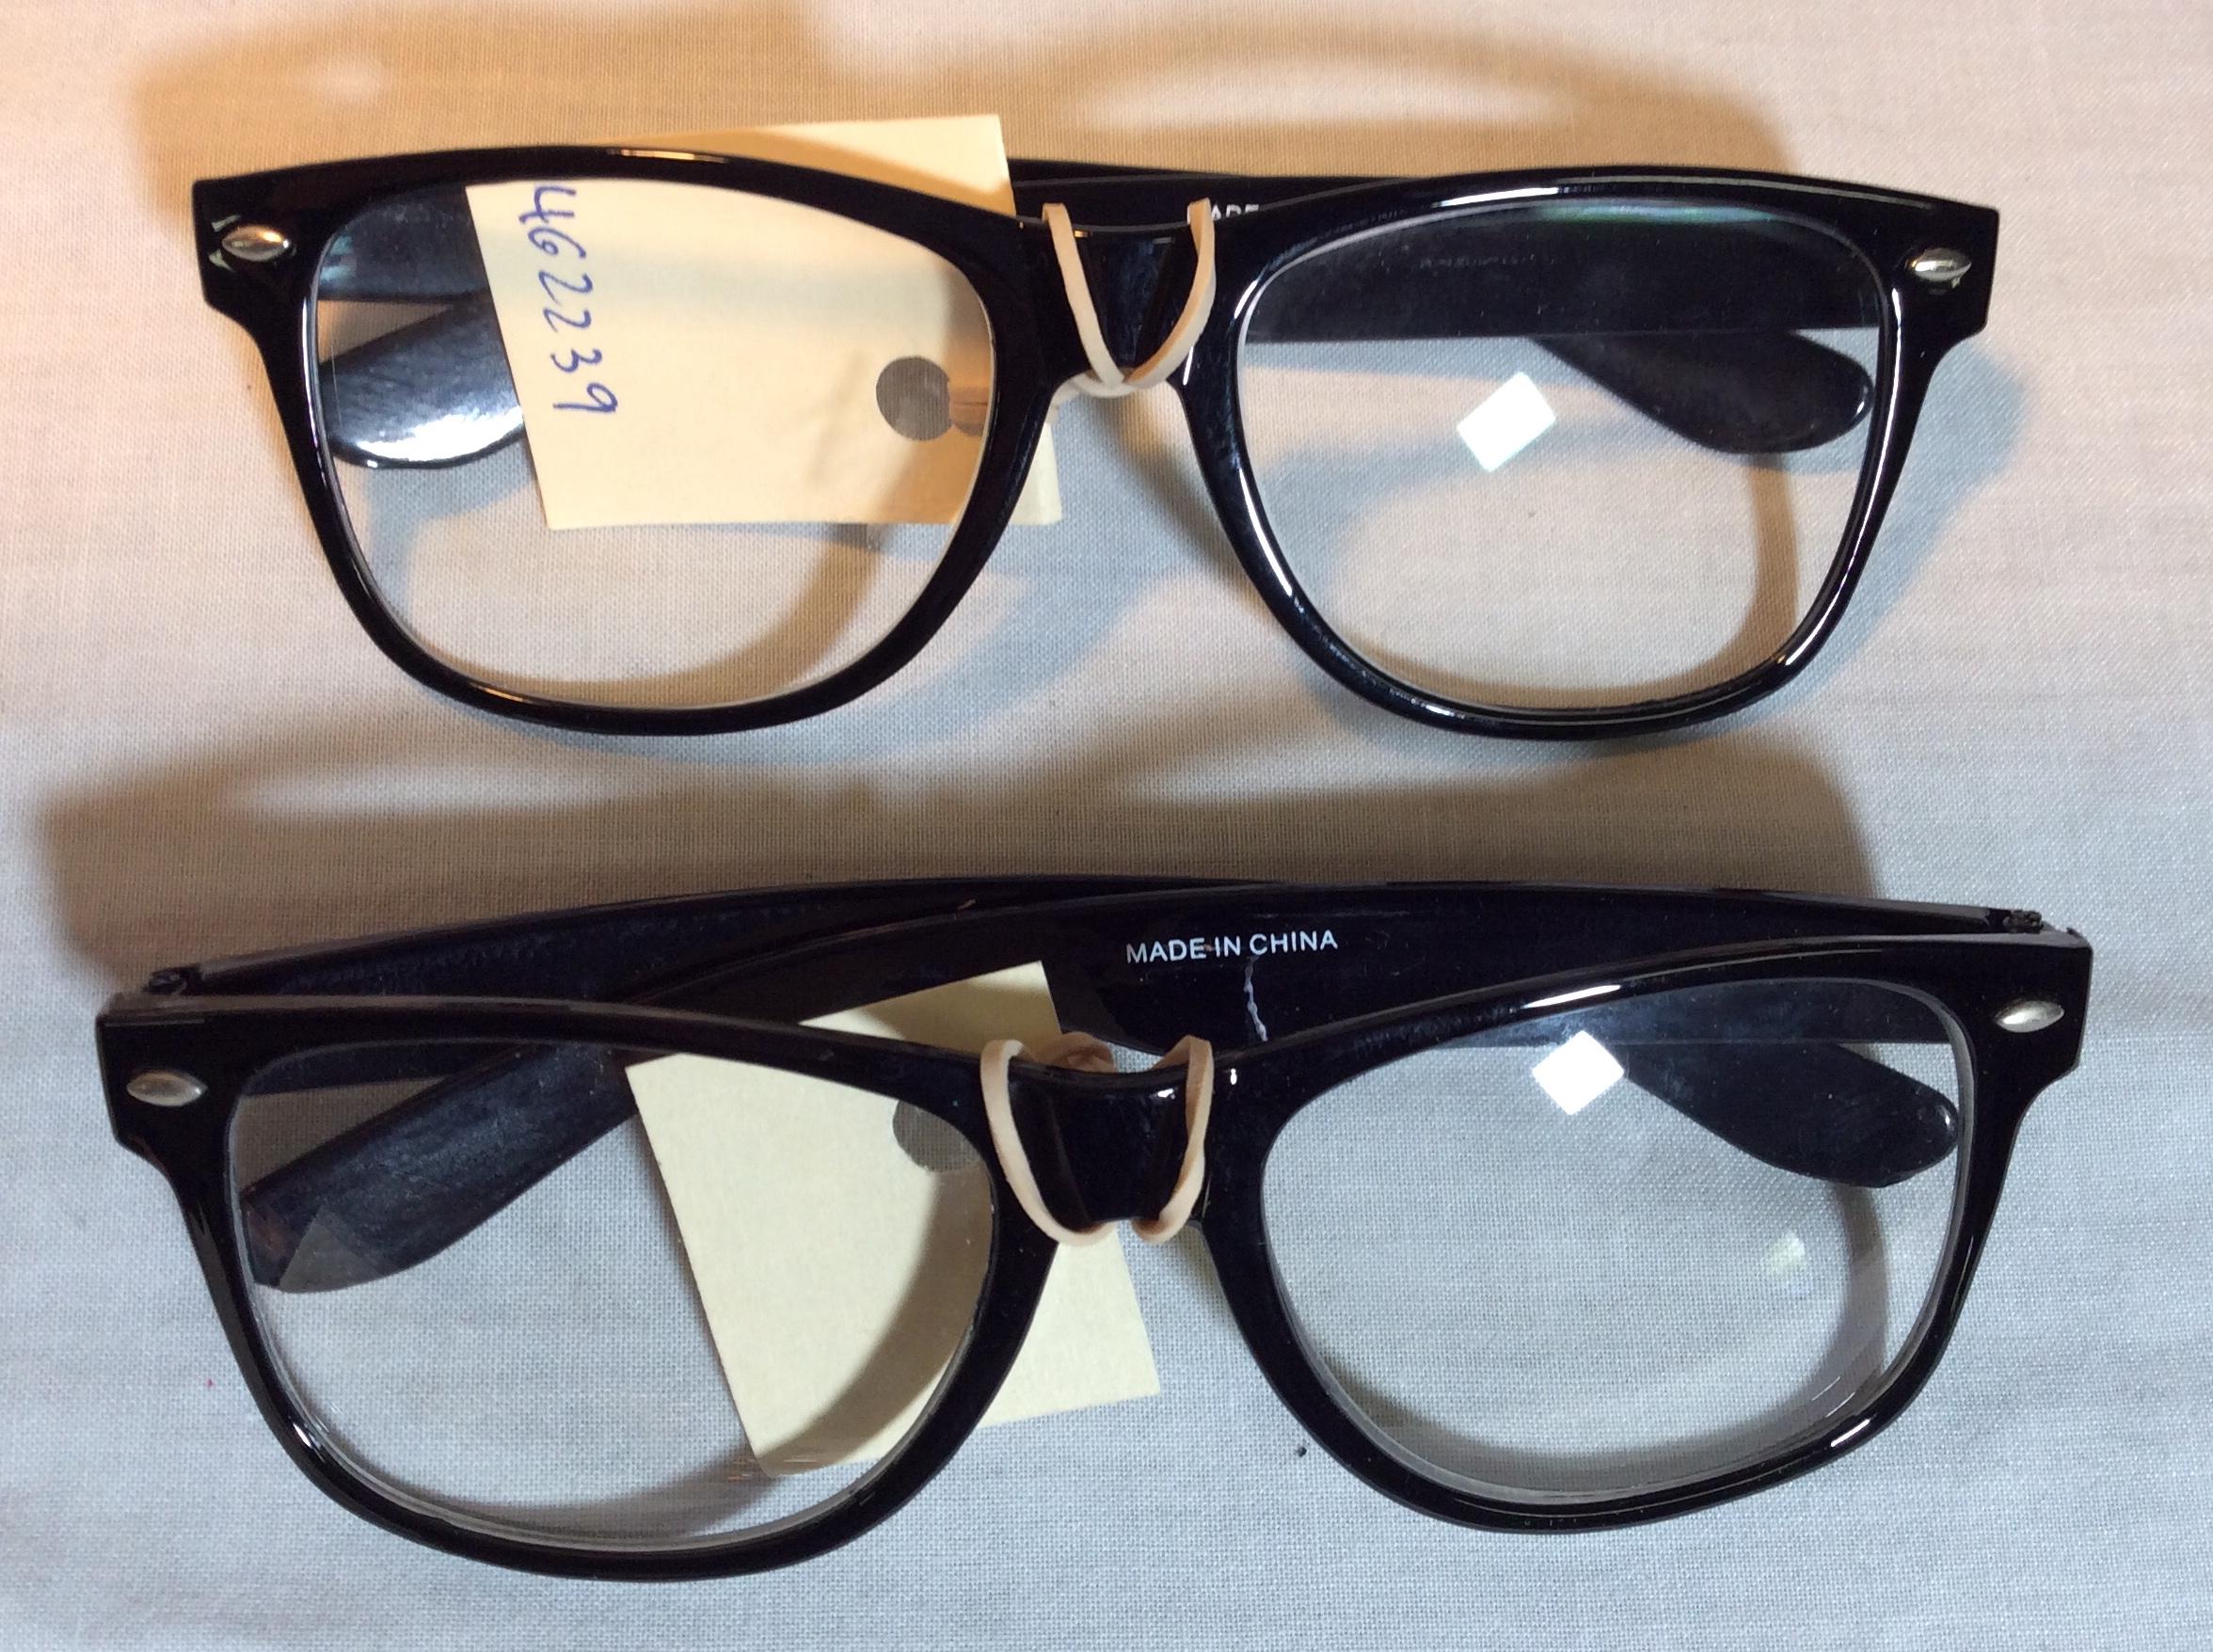 Black wayfarer style glasses